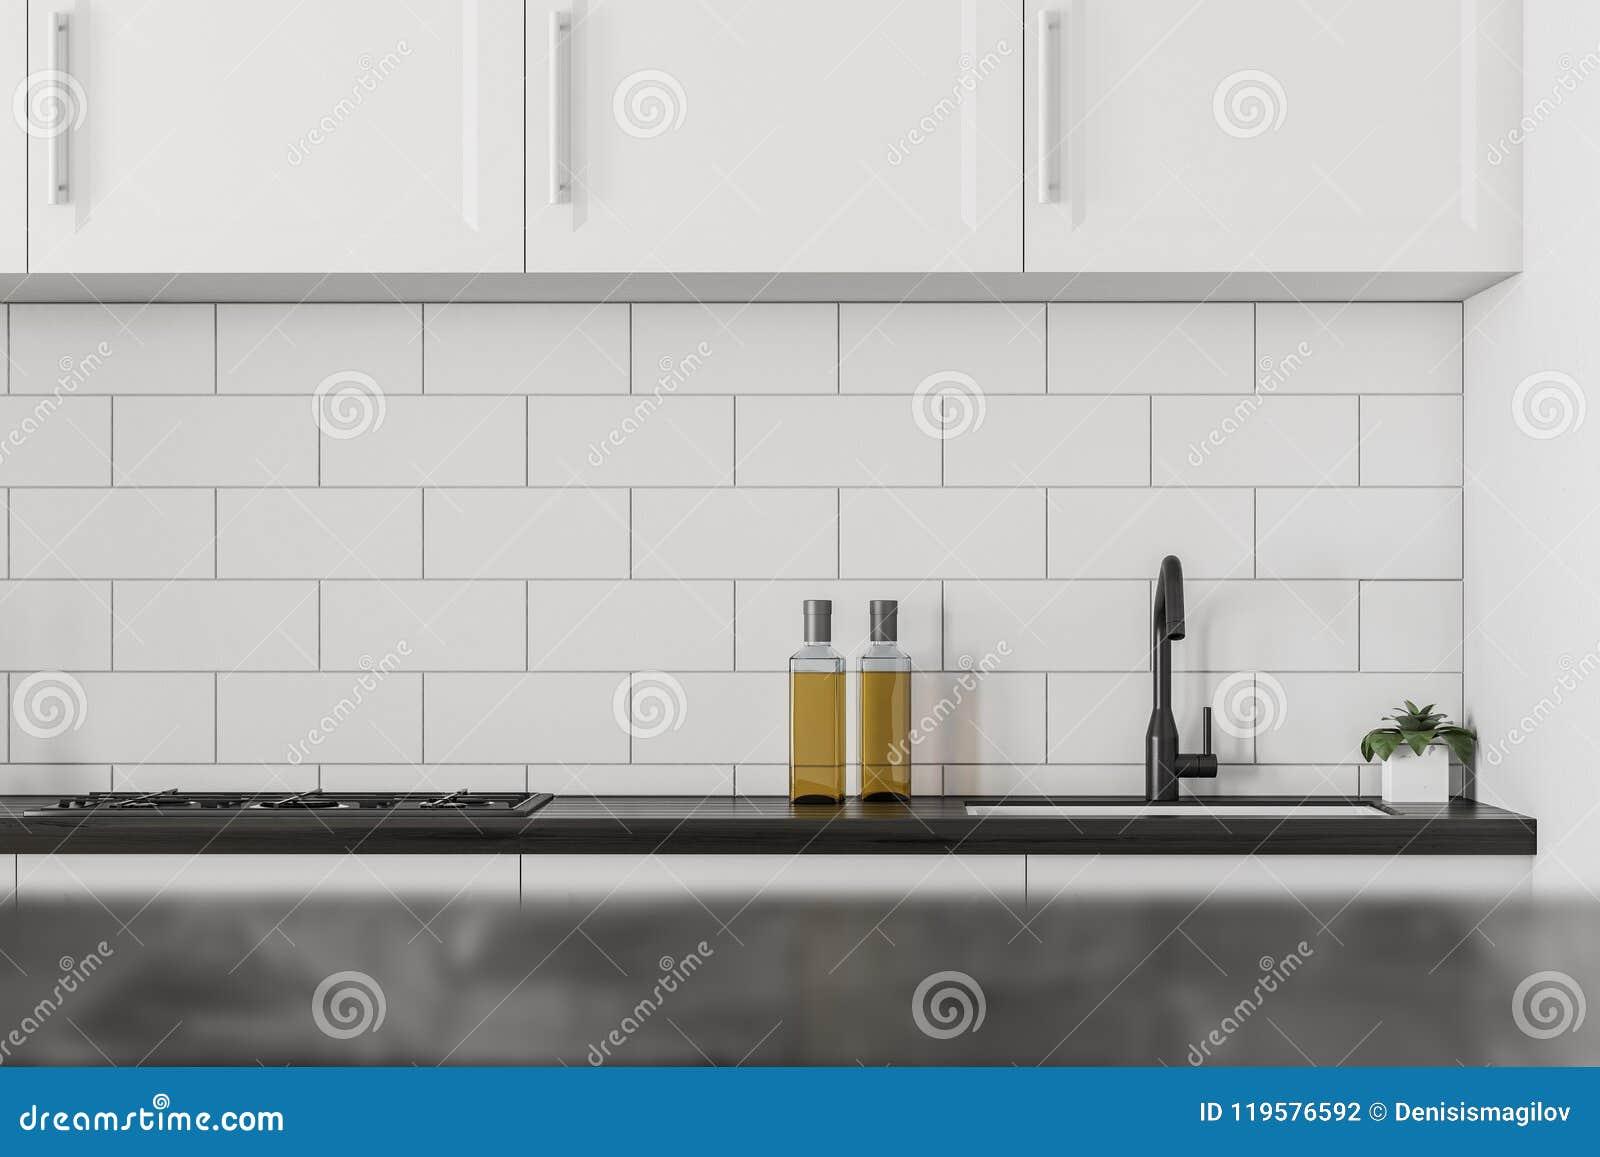 Cucina Bianca E Nera cucina bianca e nera, controsoffitto fotografia stock